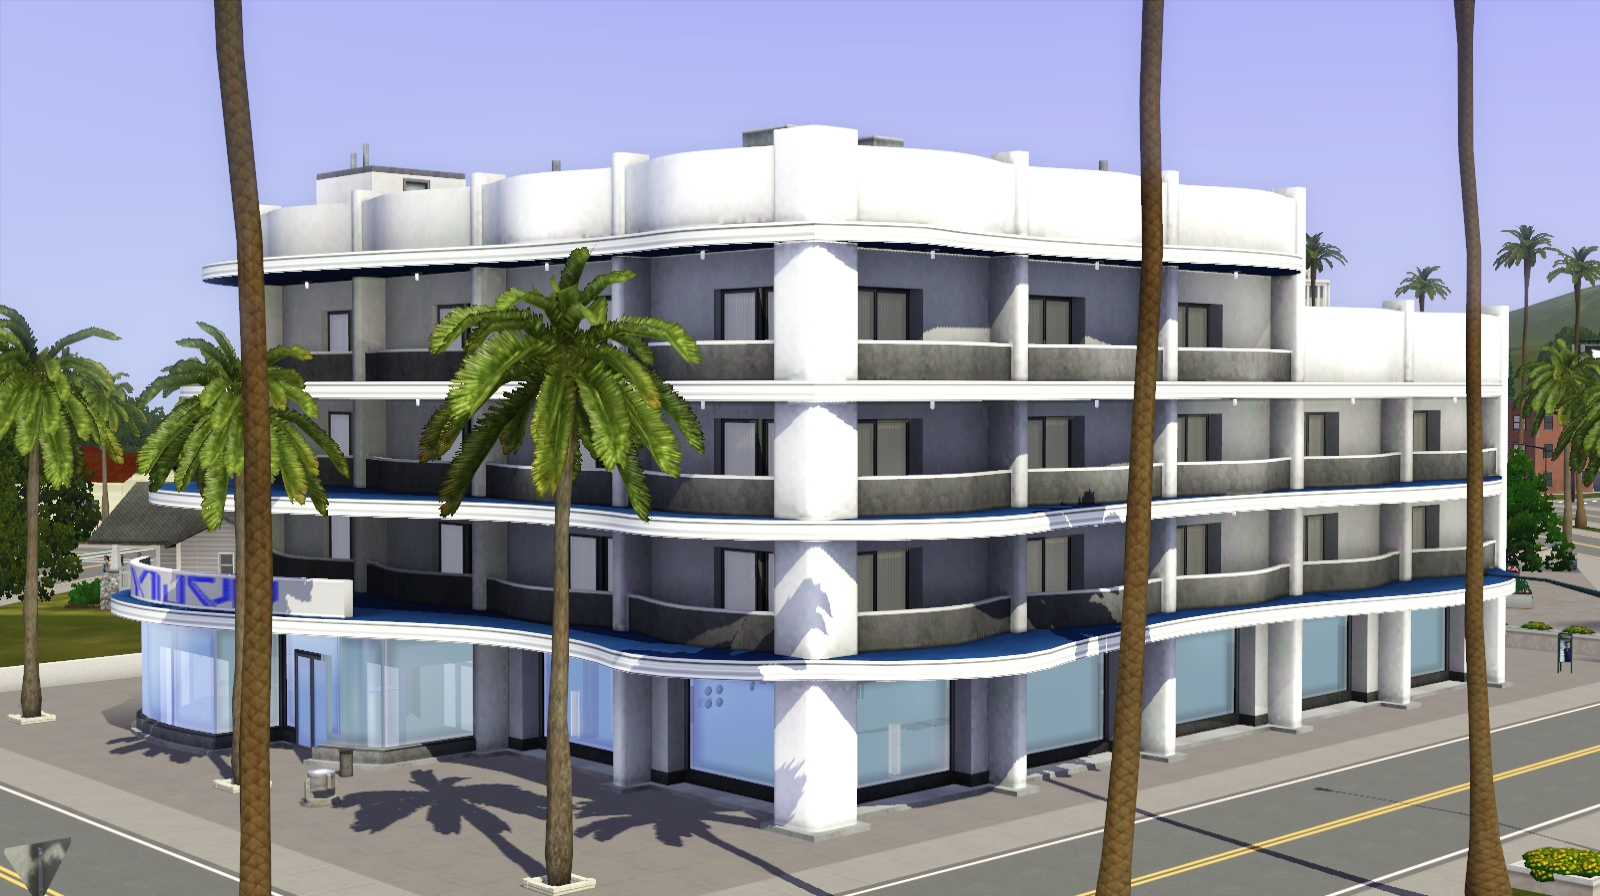 Sims 3 Community Lots Compendium Sims 3 Private Venues